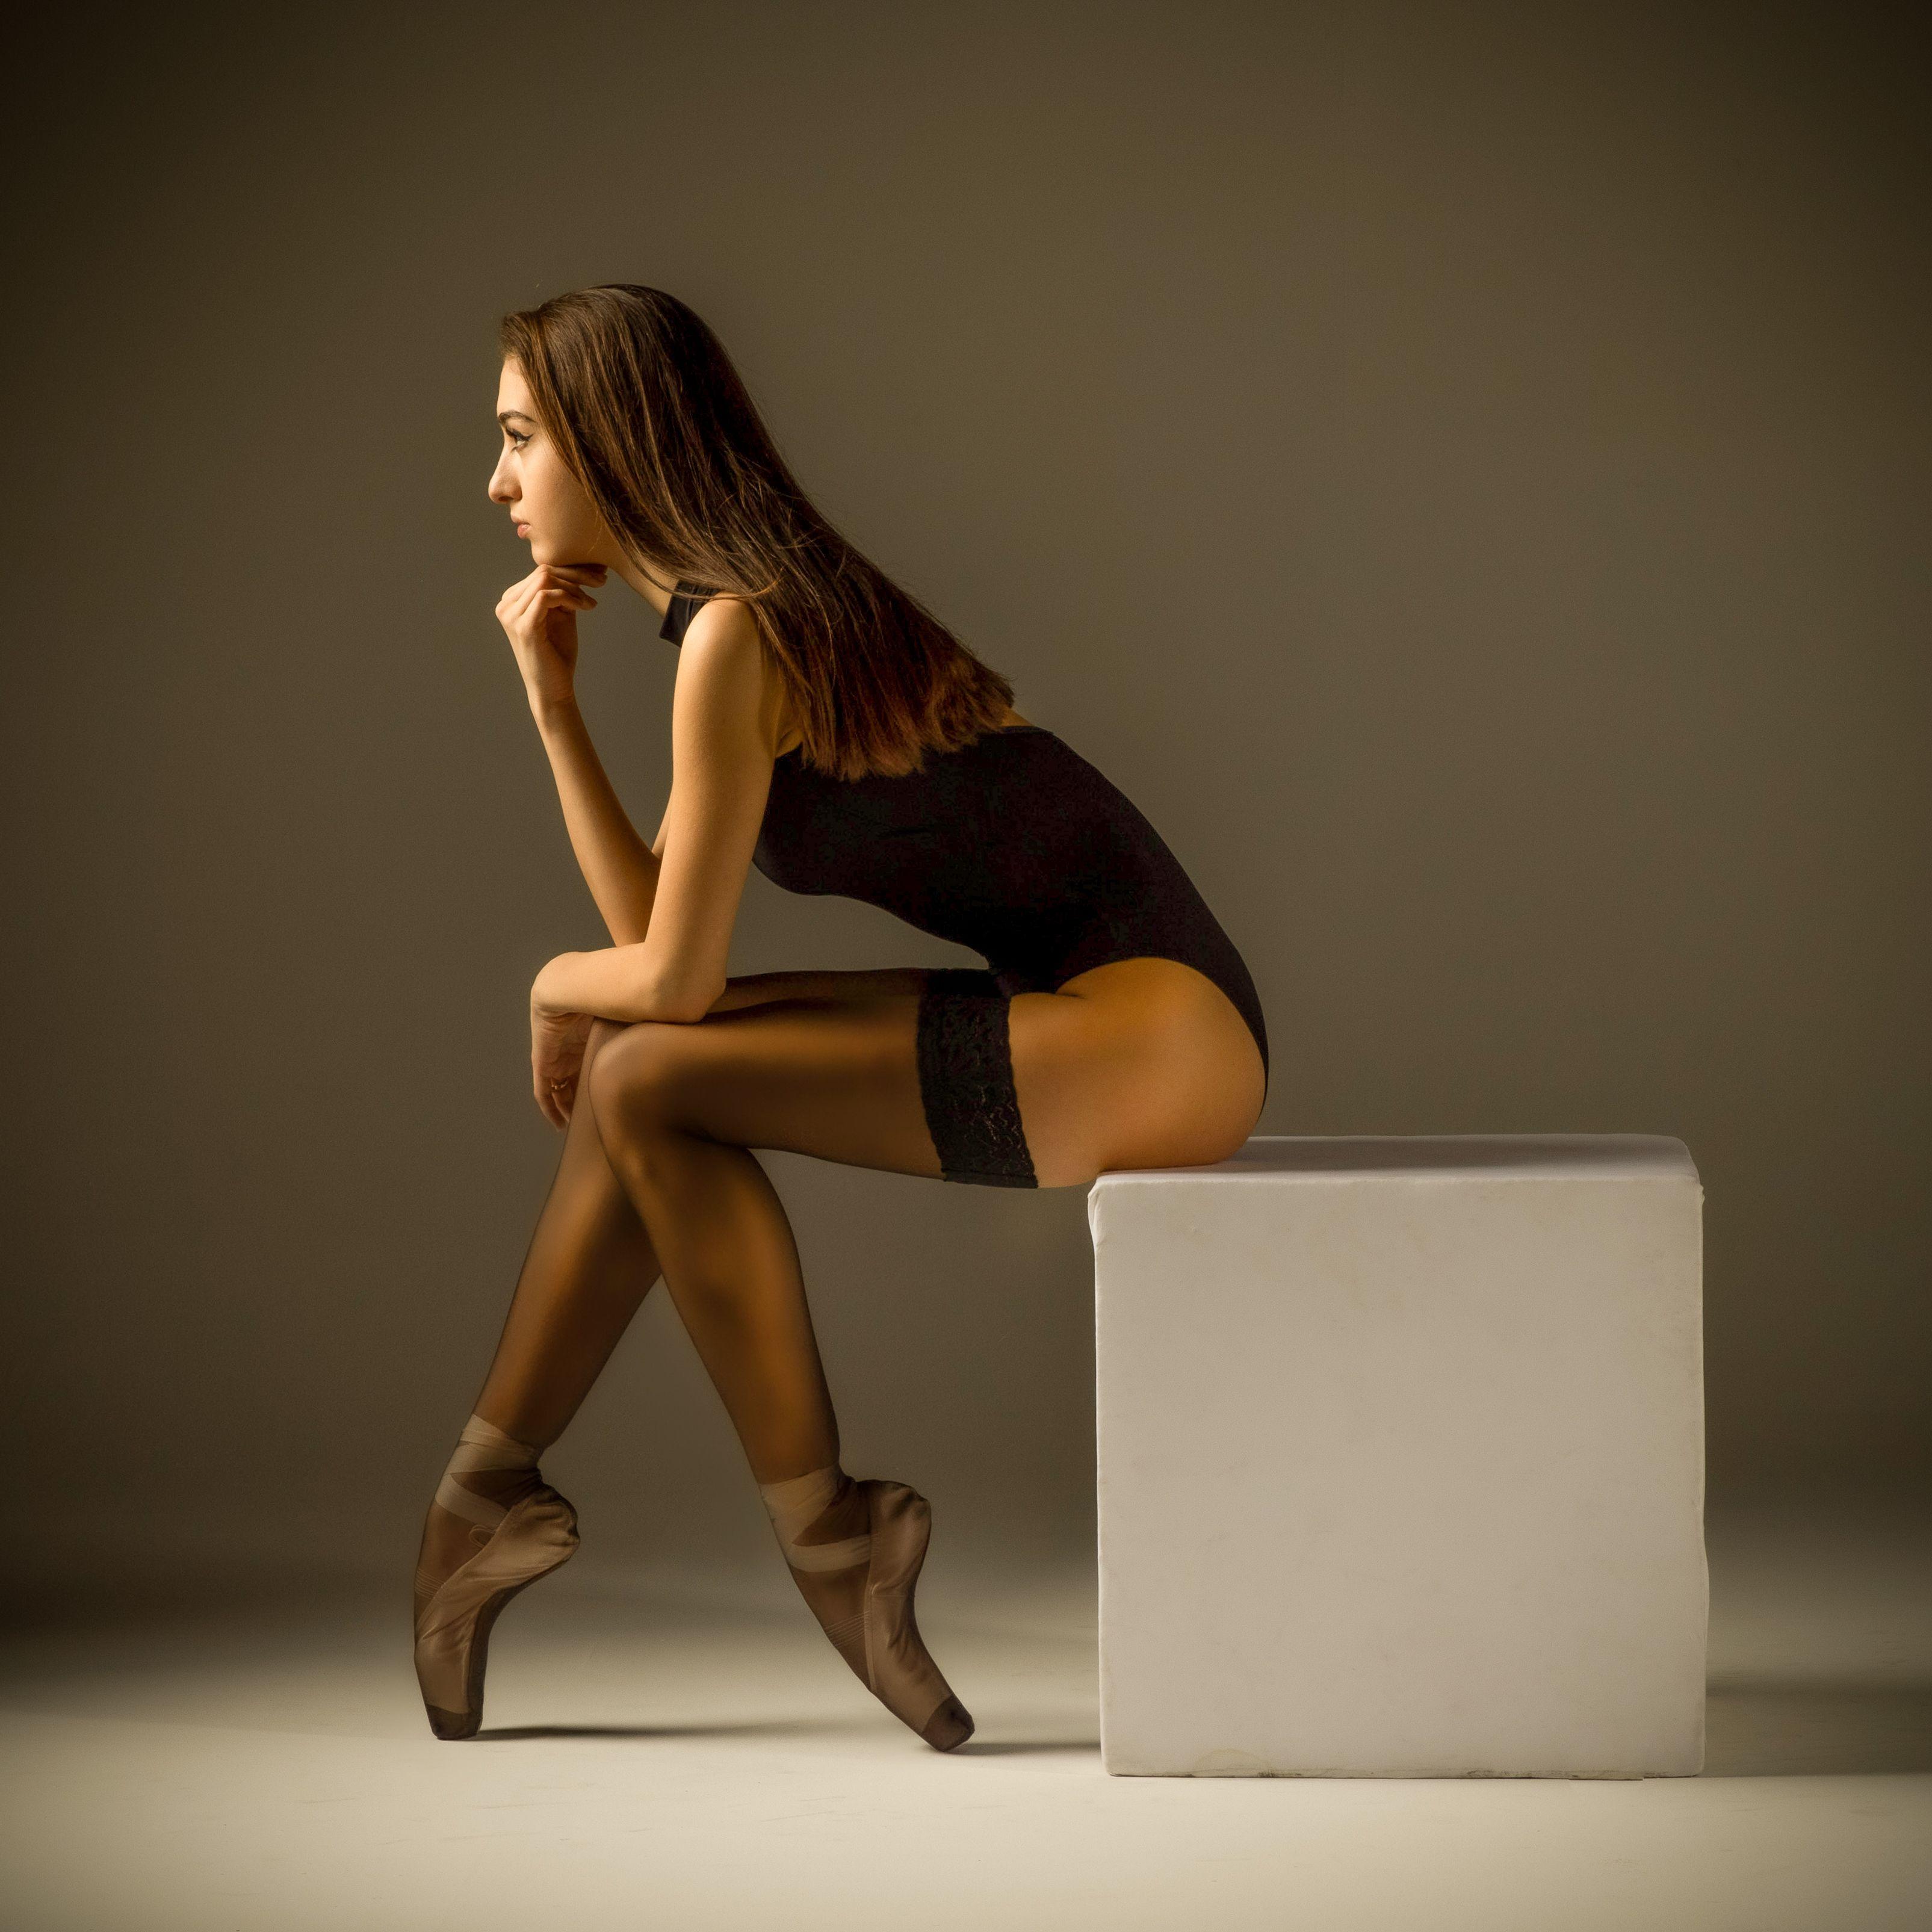 балерина,девушка,красивая,пуанты,портрет,чулки, Дмитрий Александров